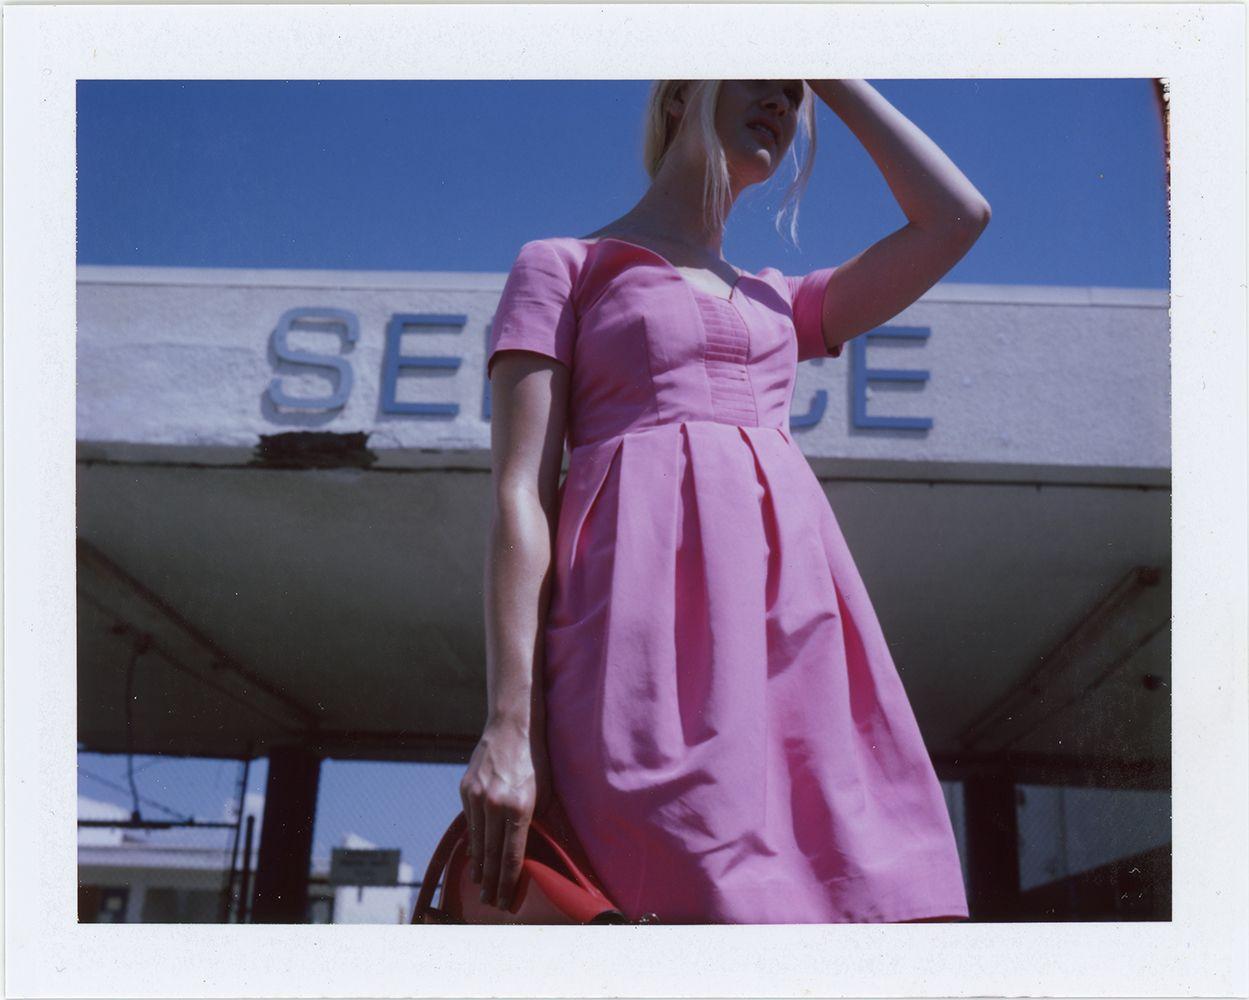 Hannah Holman photographed by Lina Scheynius for Orla Kiely.